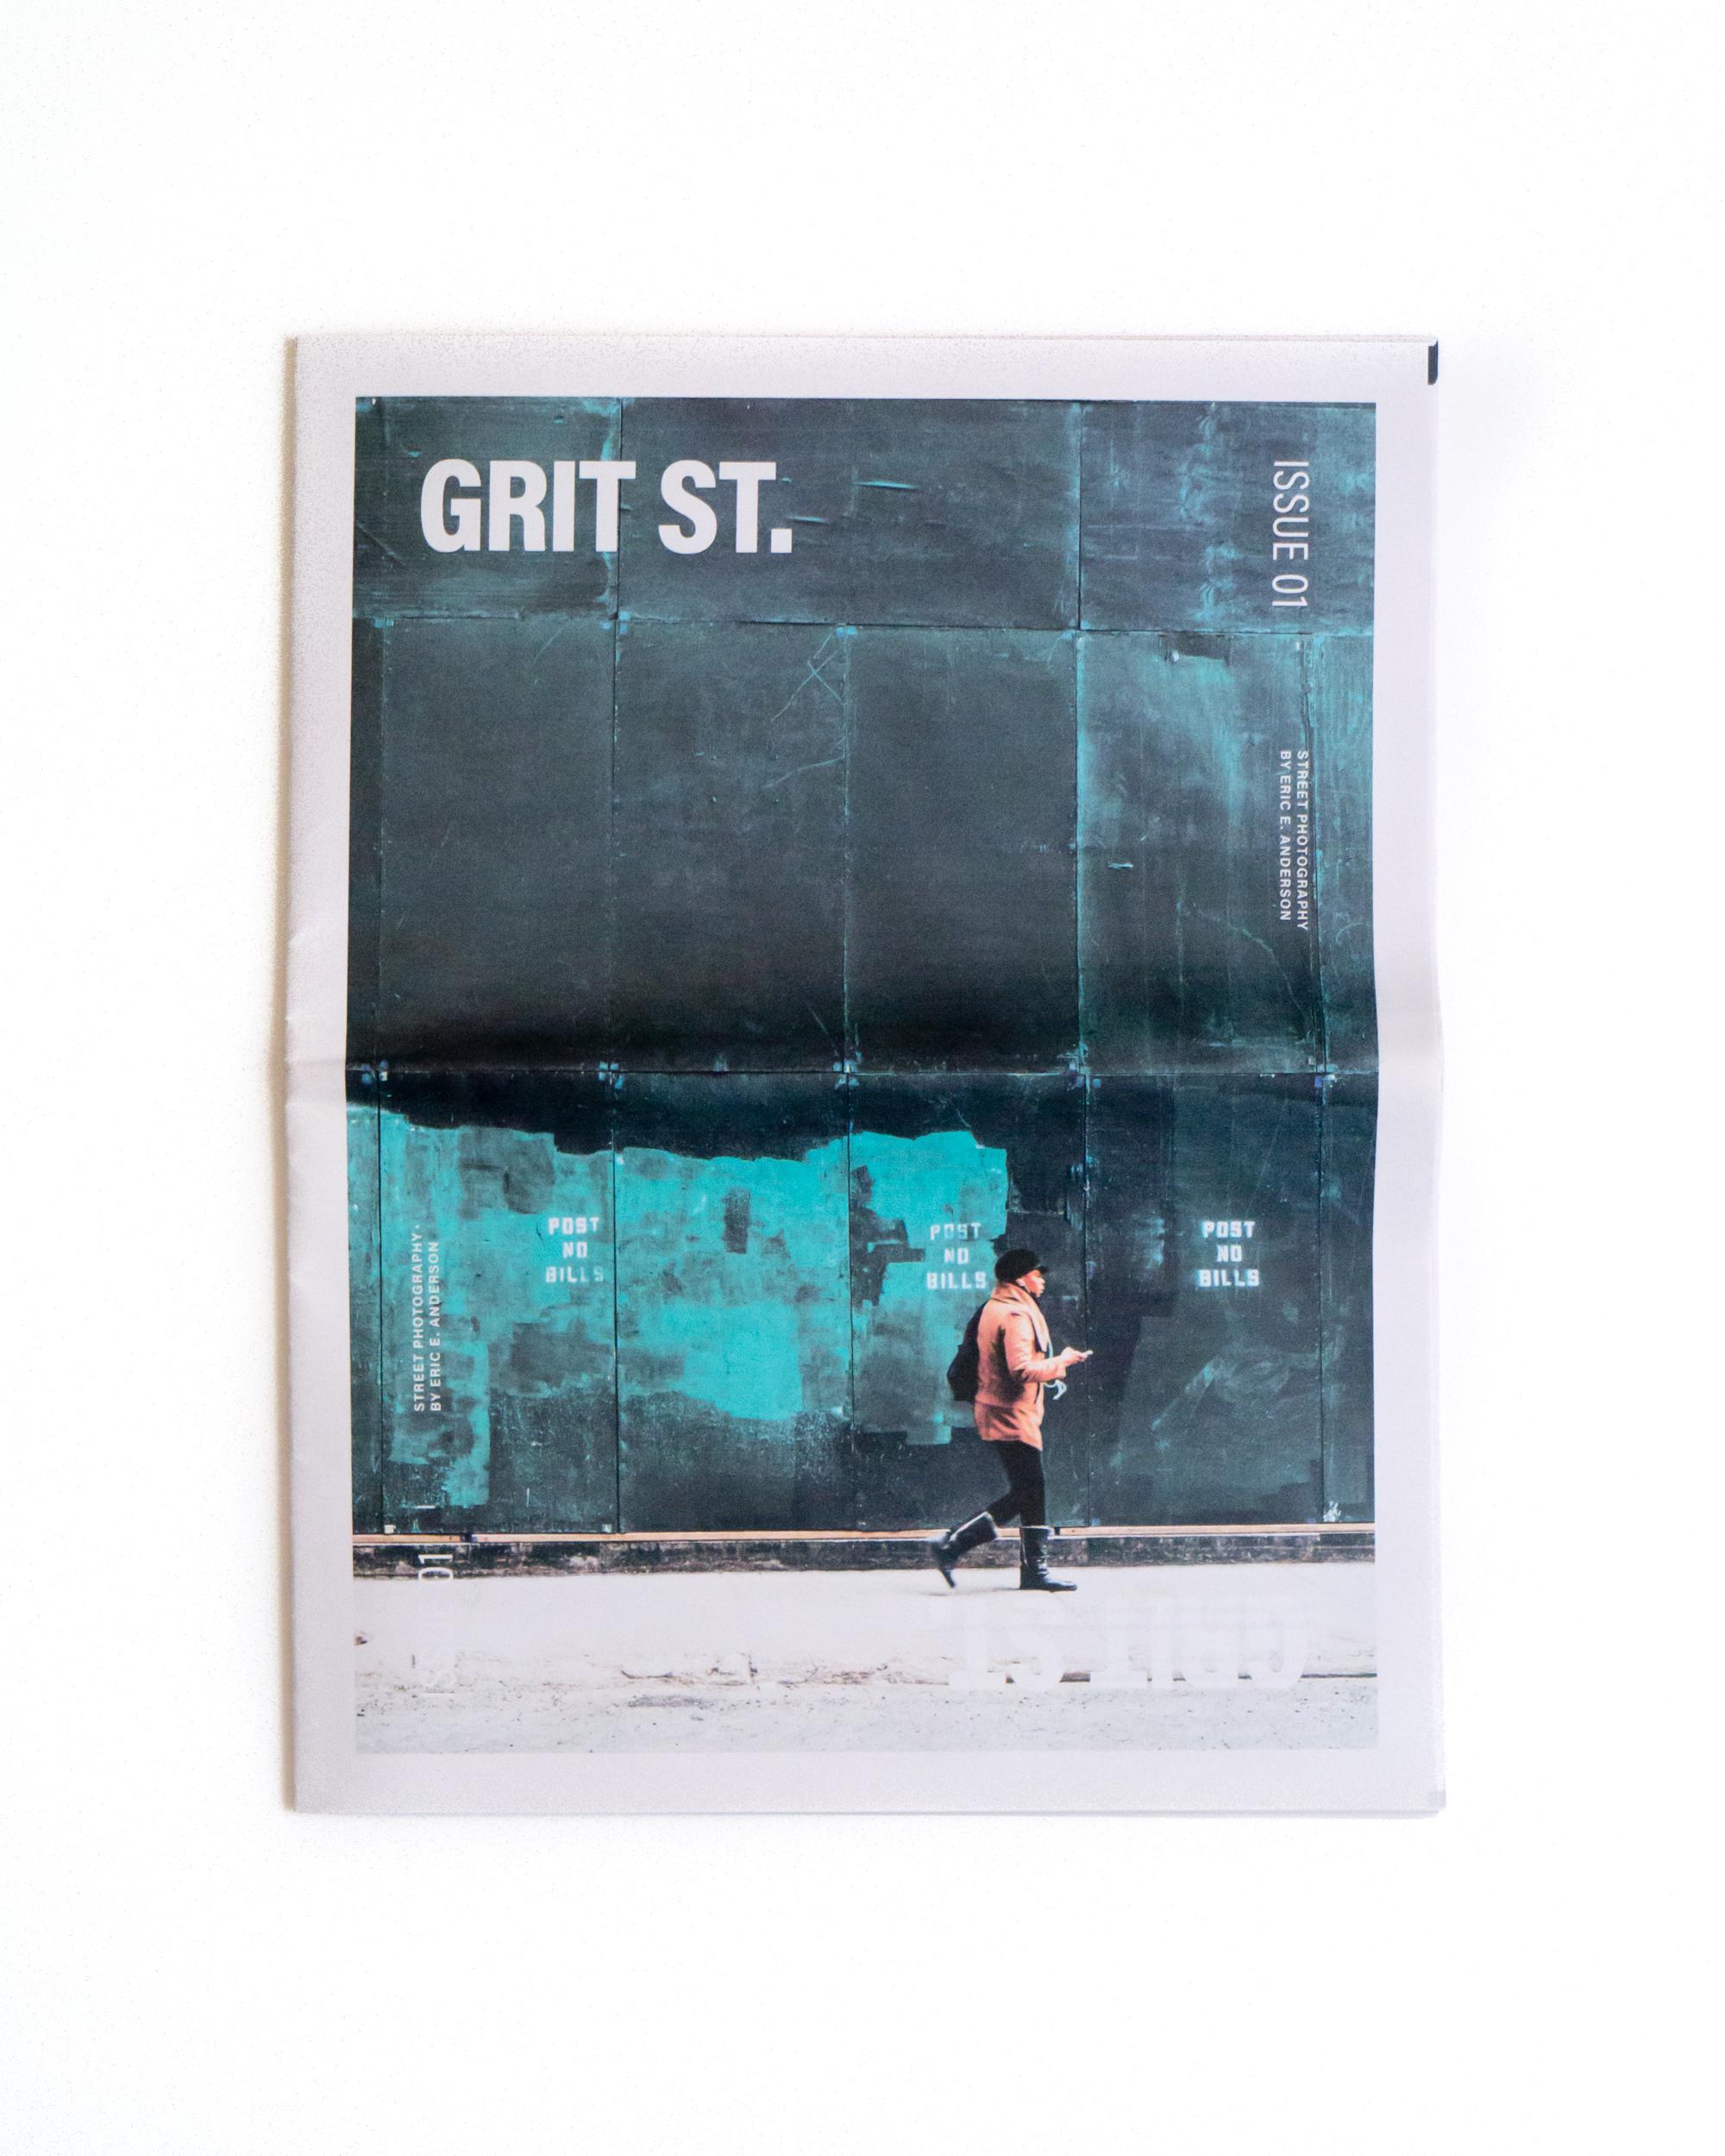 grit-street-01-newsprint-promo-2.jpg